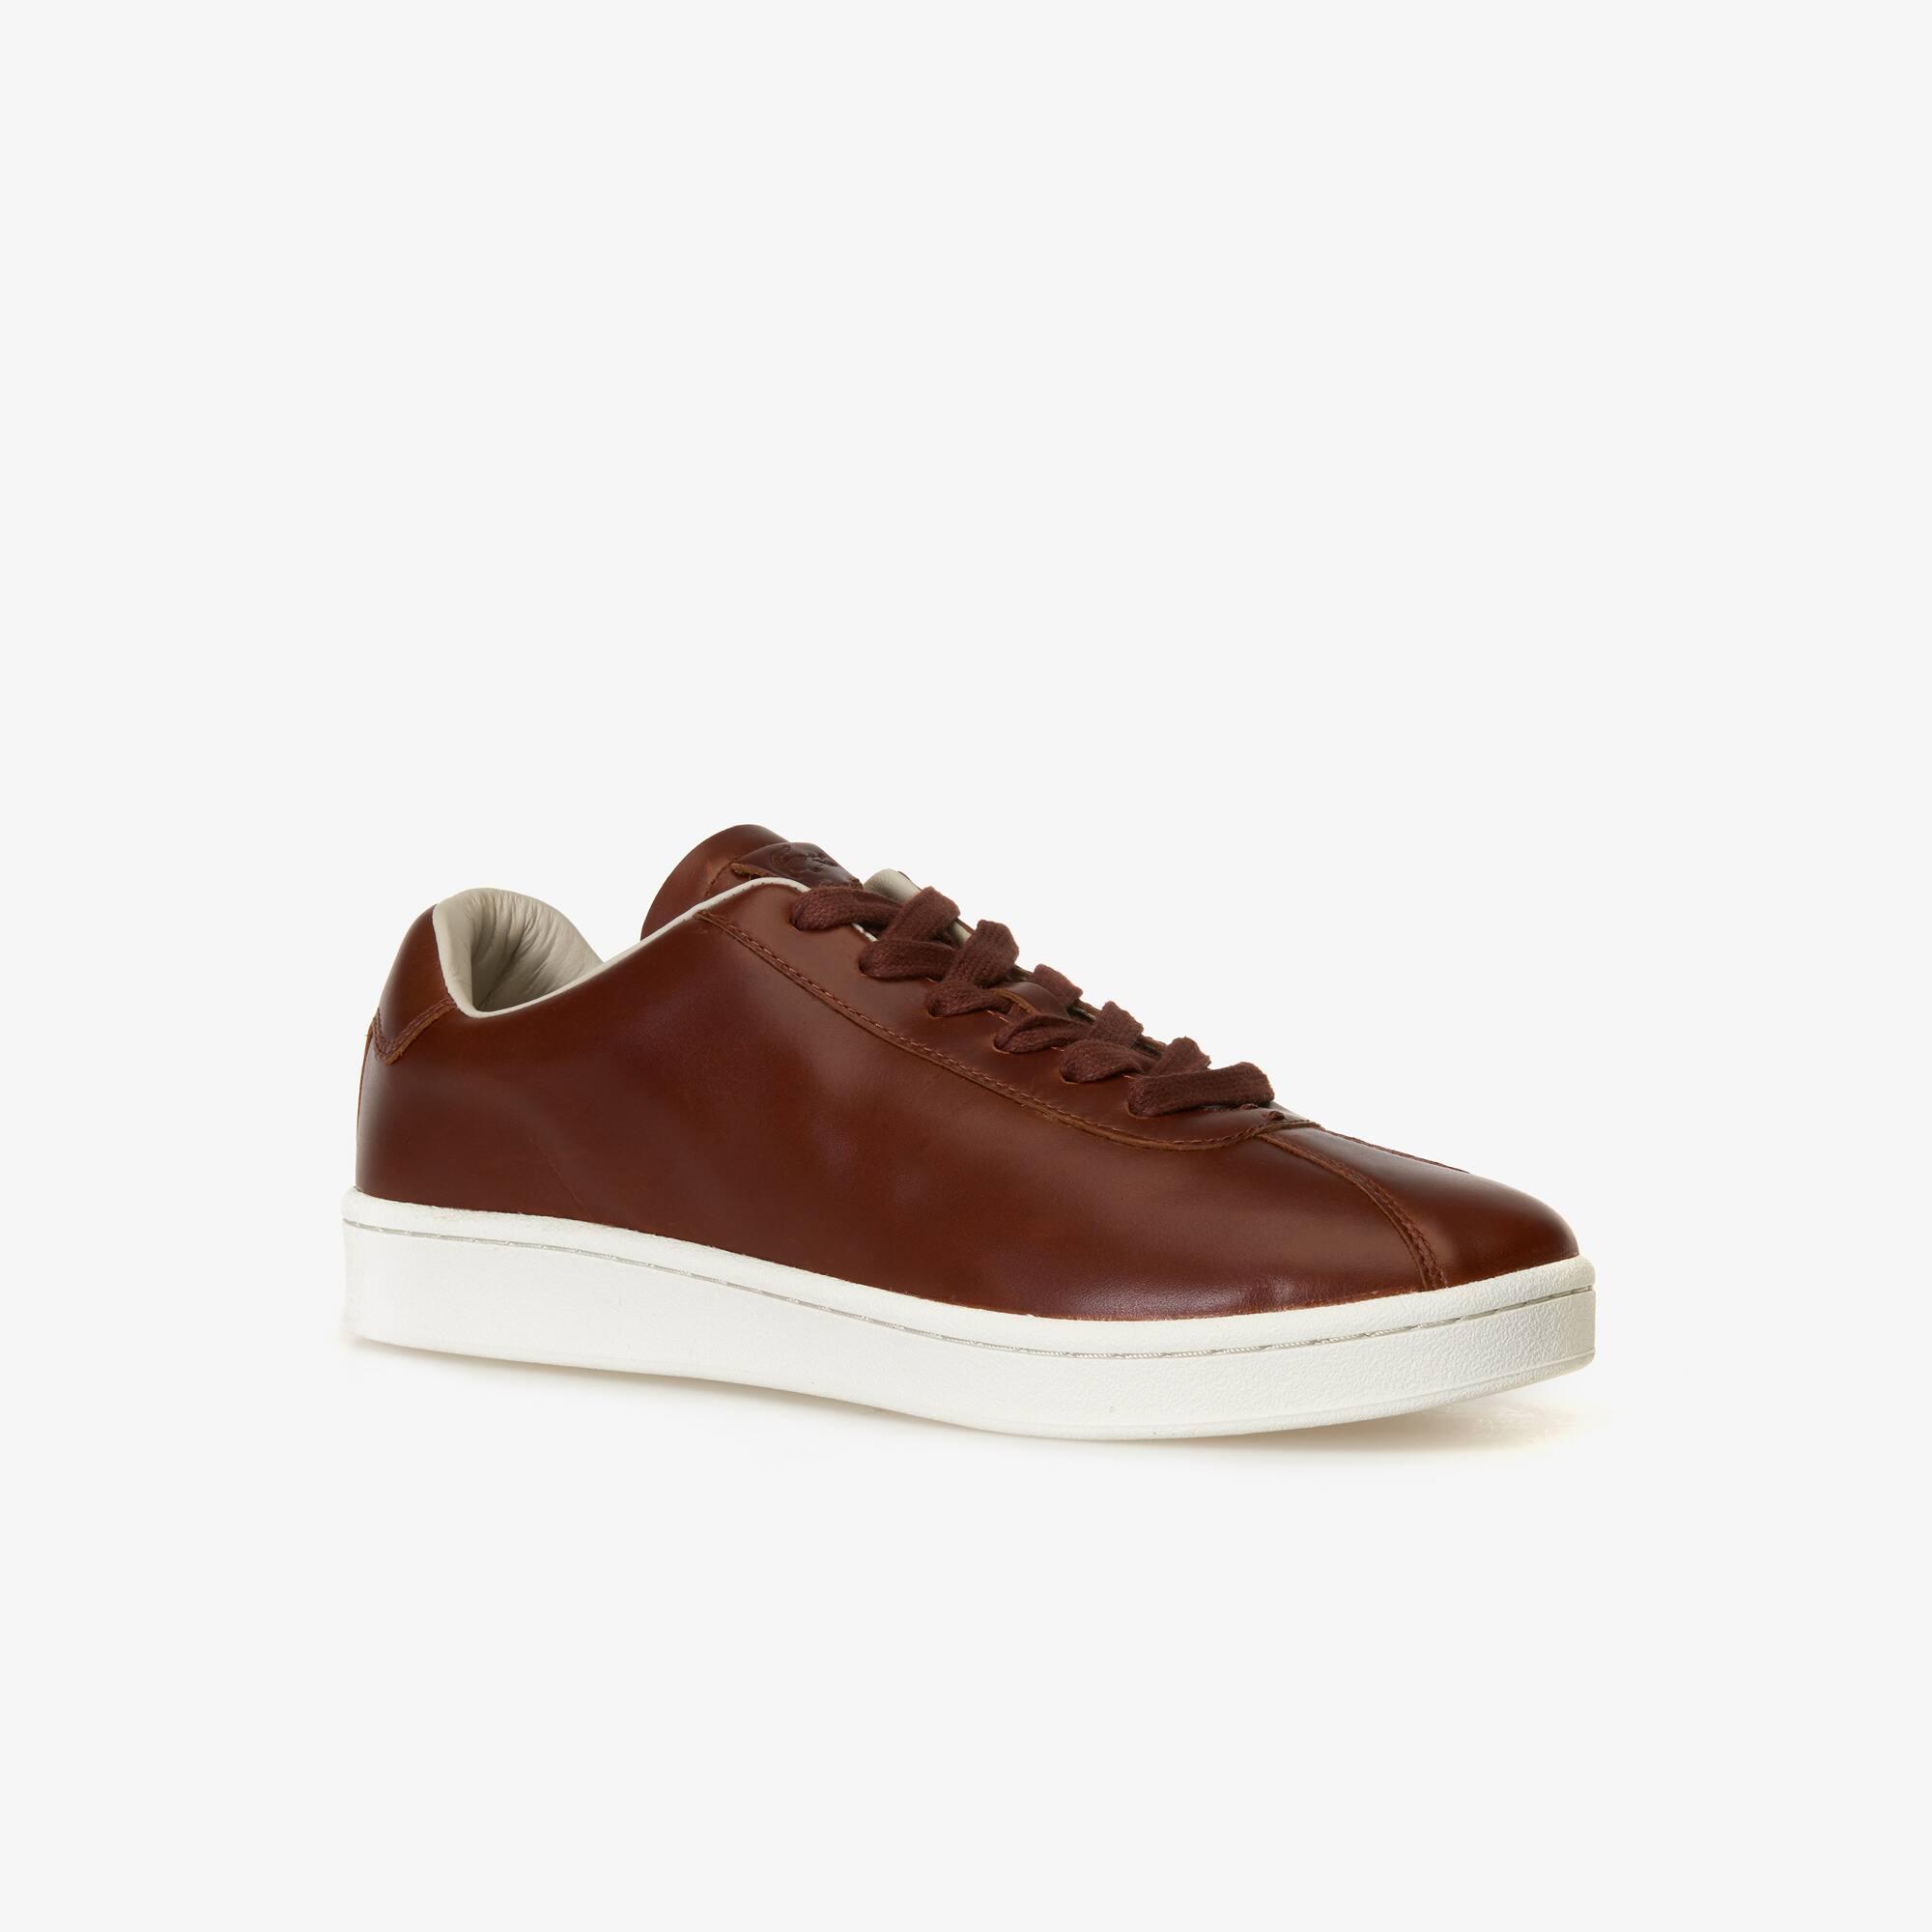 c54e36de3bff Men s Masters Leather Sneakers